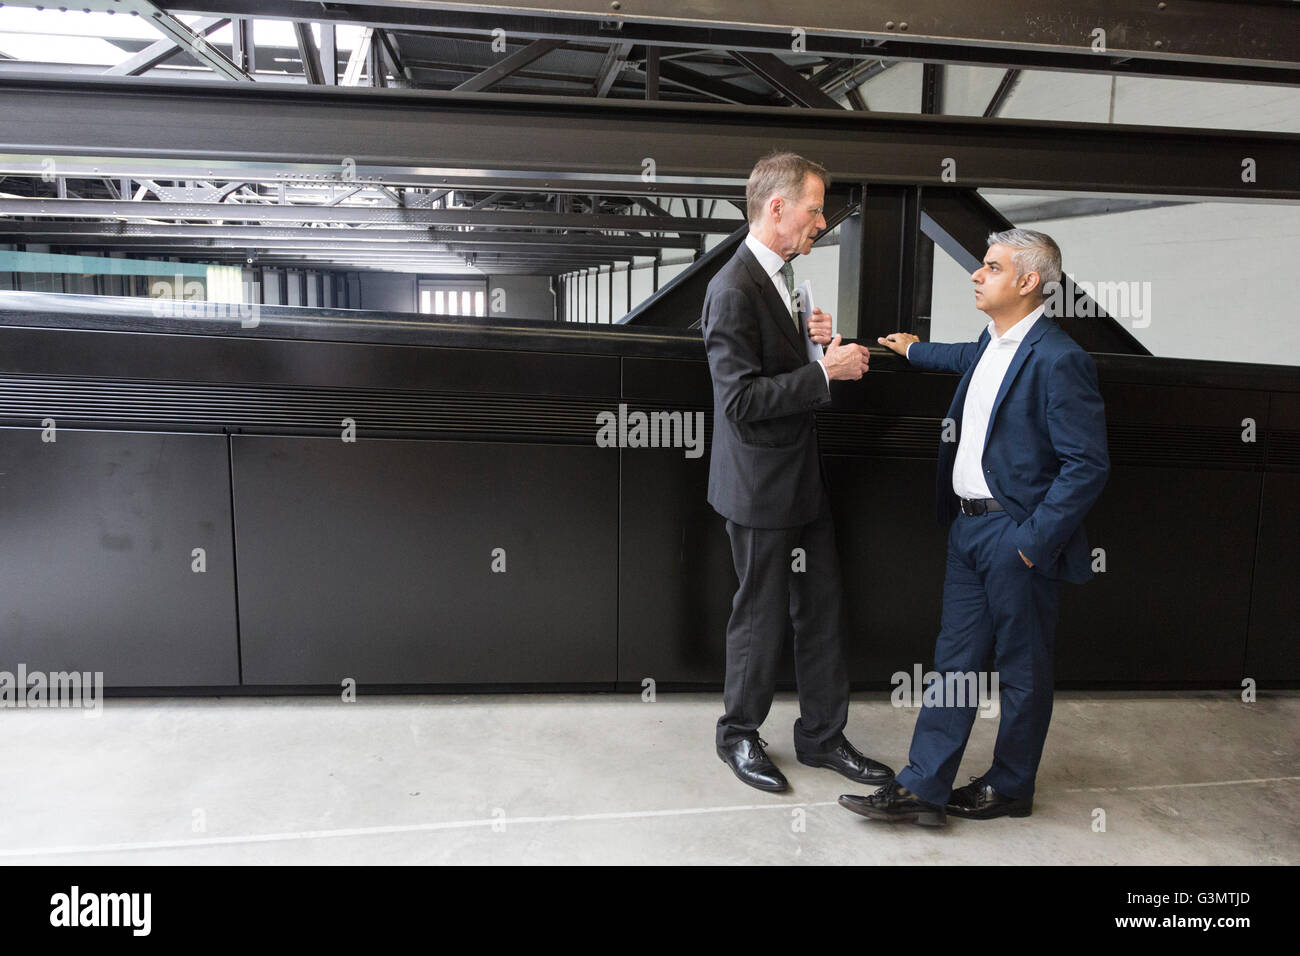 London, UK. 14 June 2016. Sir Nicholas Serota, director of the Tate art museums and galleries, gives Sadiq Khan, - Stock Image